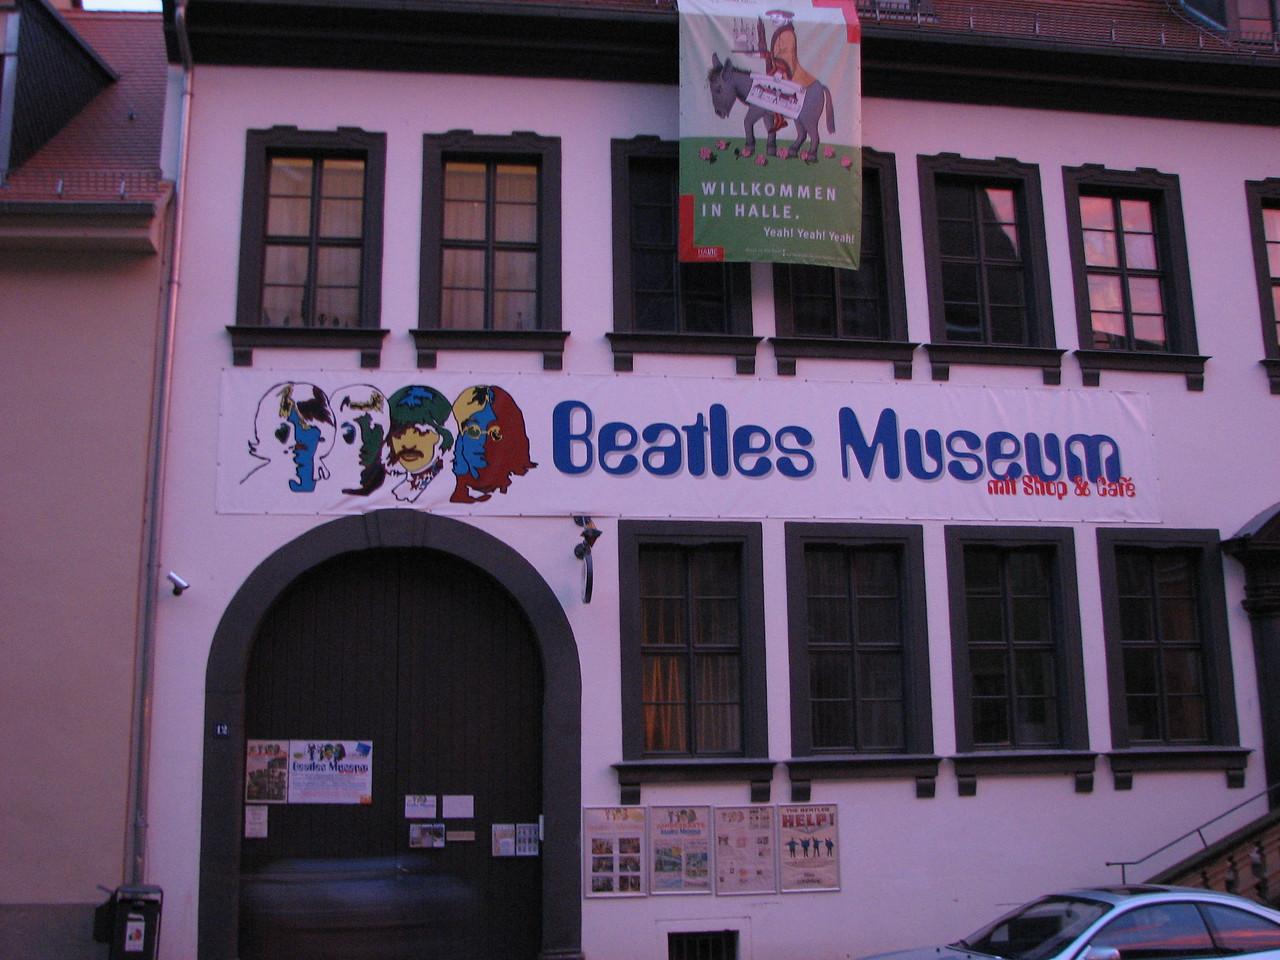 Beatles Museum in Halle